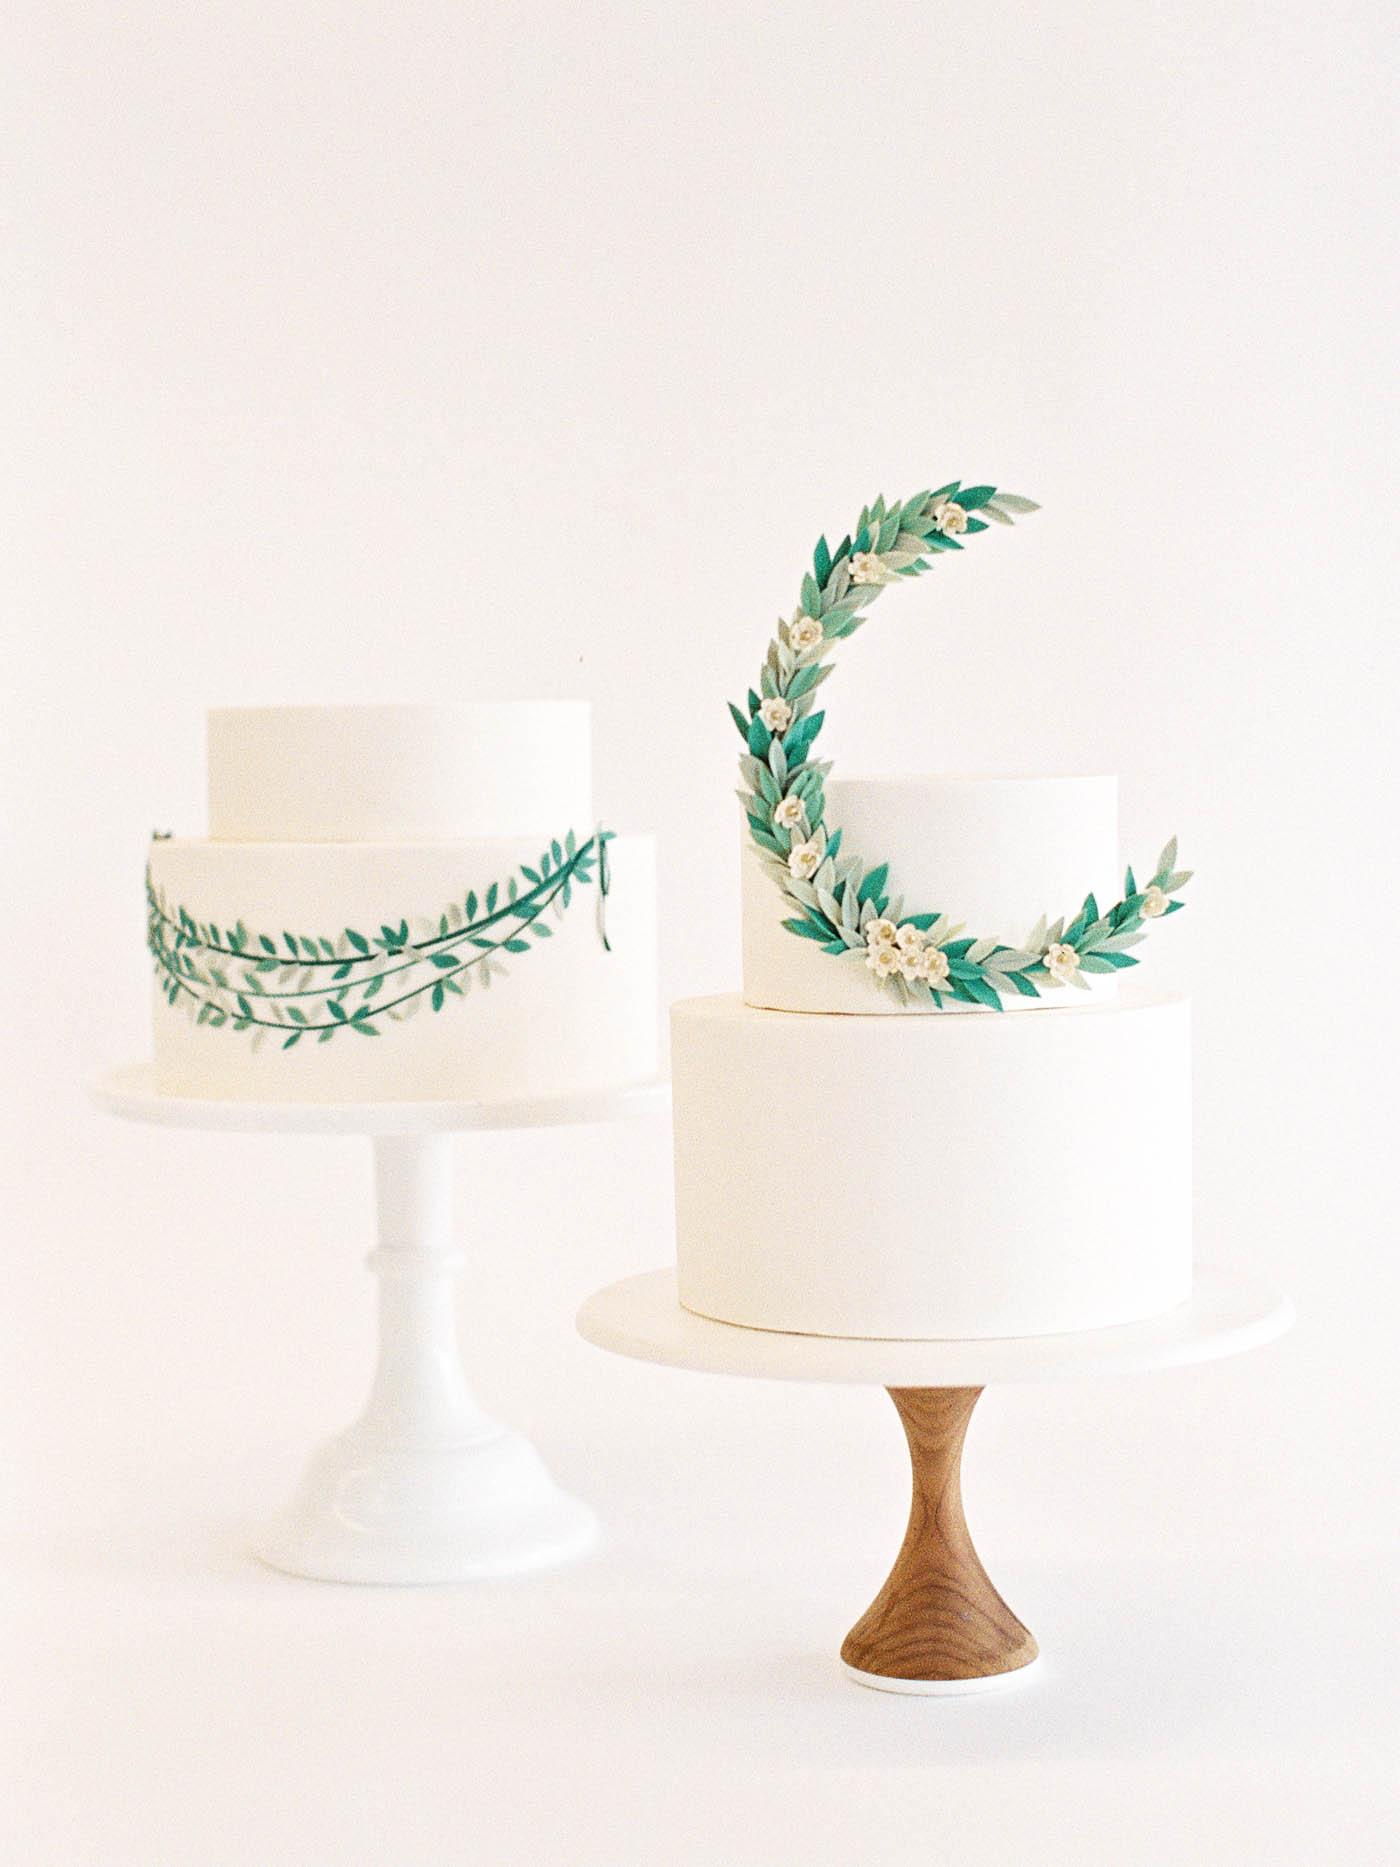 Delicate-Wedding-Cakes-13-Jen_Huang-002343-R1-007.jpg